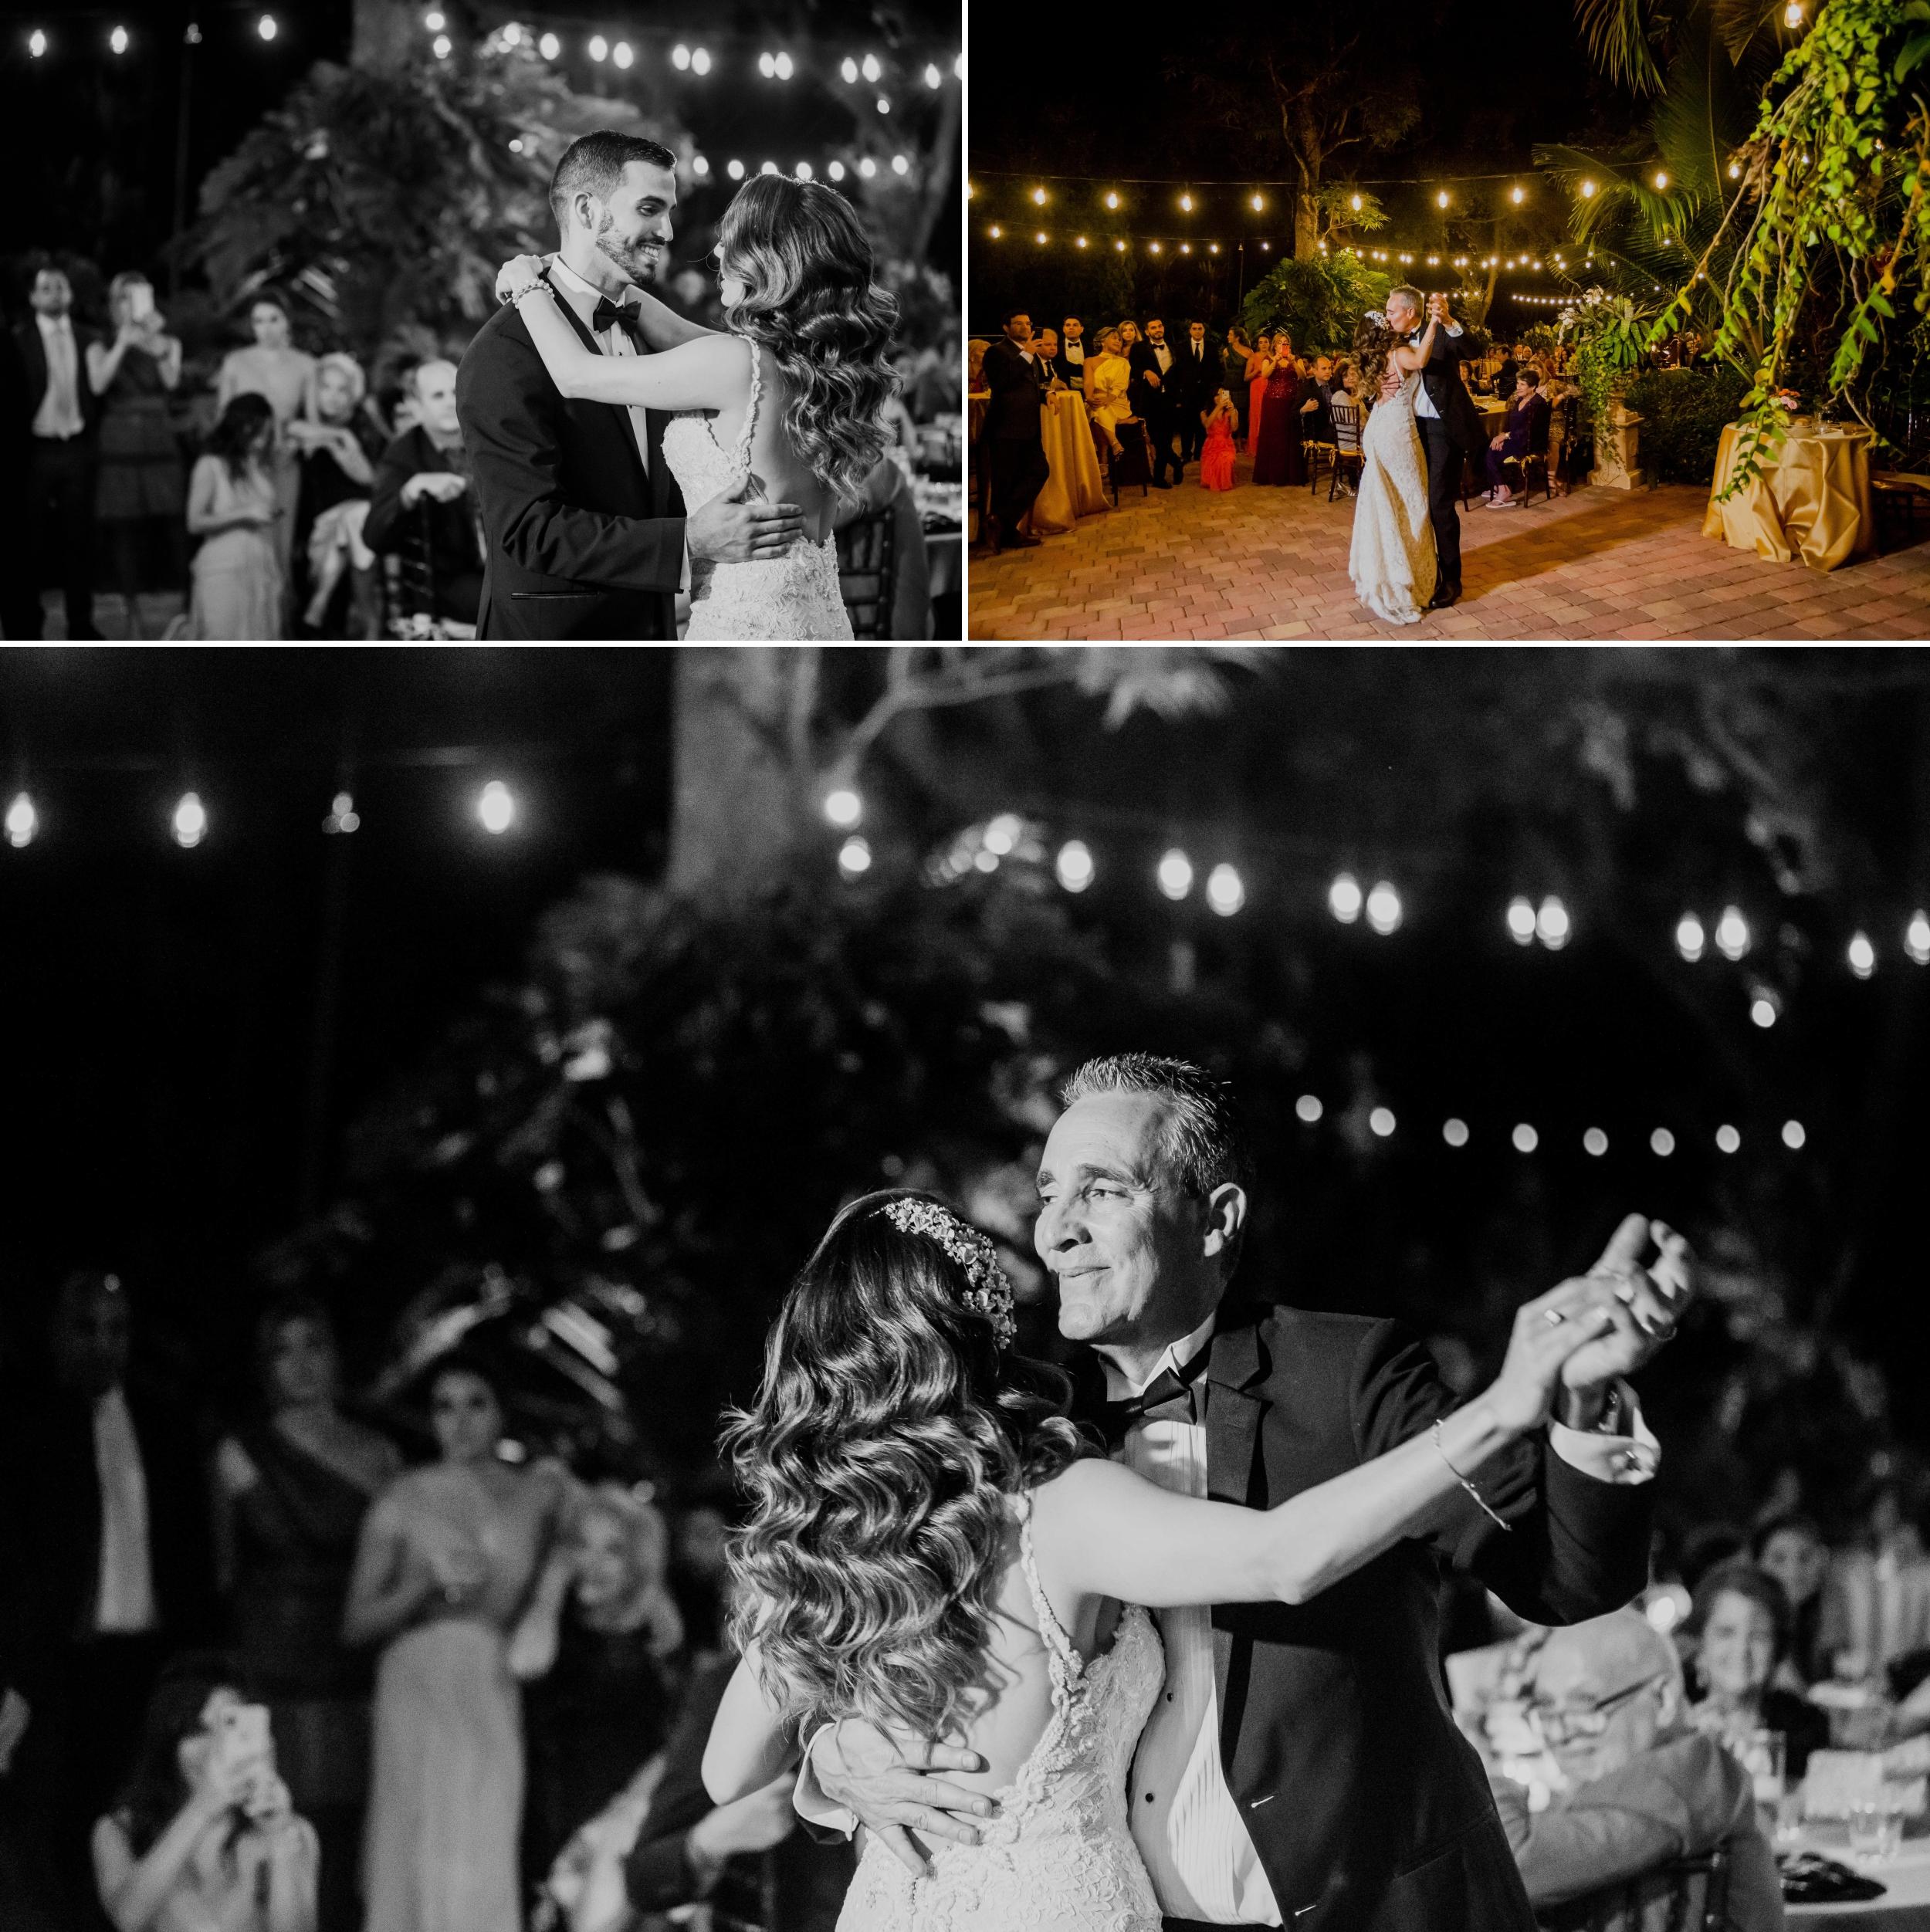 Wedding Miller Plantation Photography by Santy Martinez 16.jpg